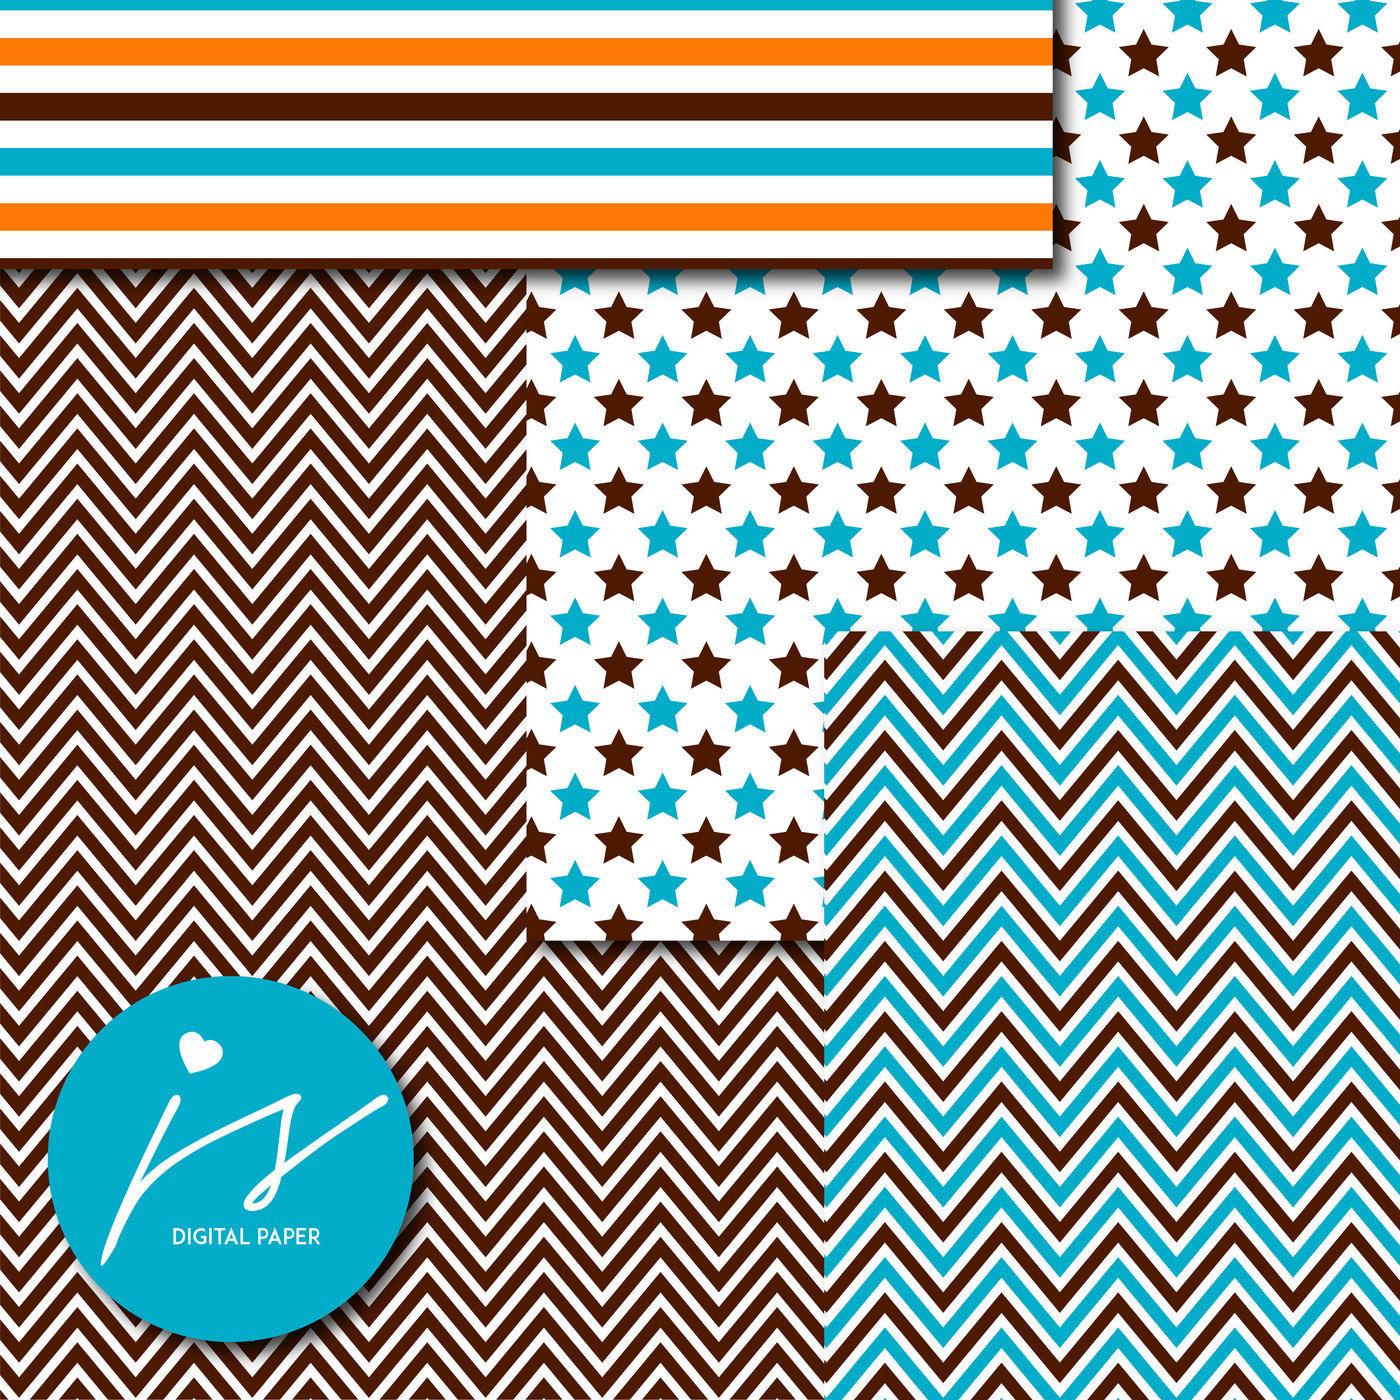 Teal Brown And Orange Digital Scrapbooking Paper Mi 845 By Js Digital Paper Thehungryjpeg Com